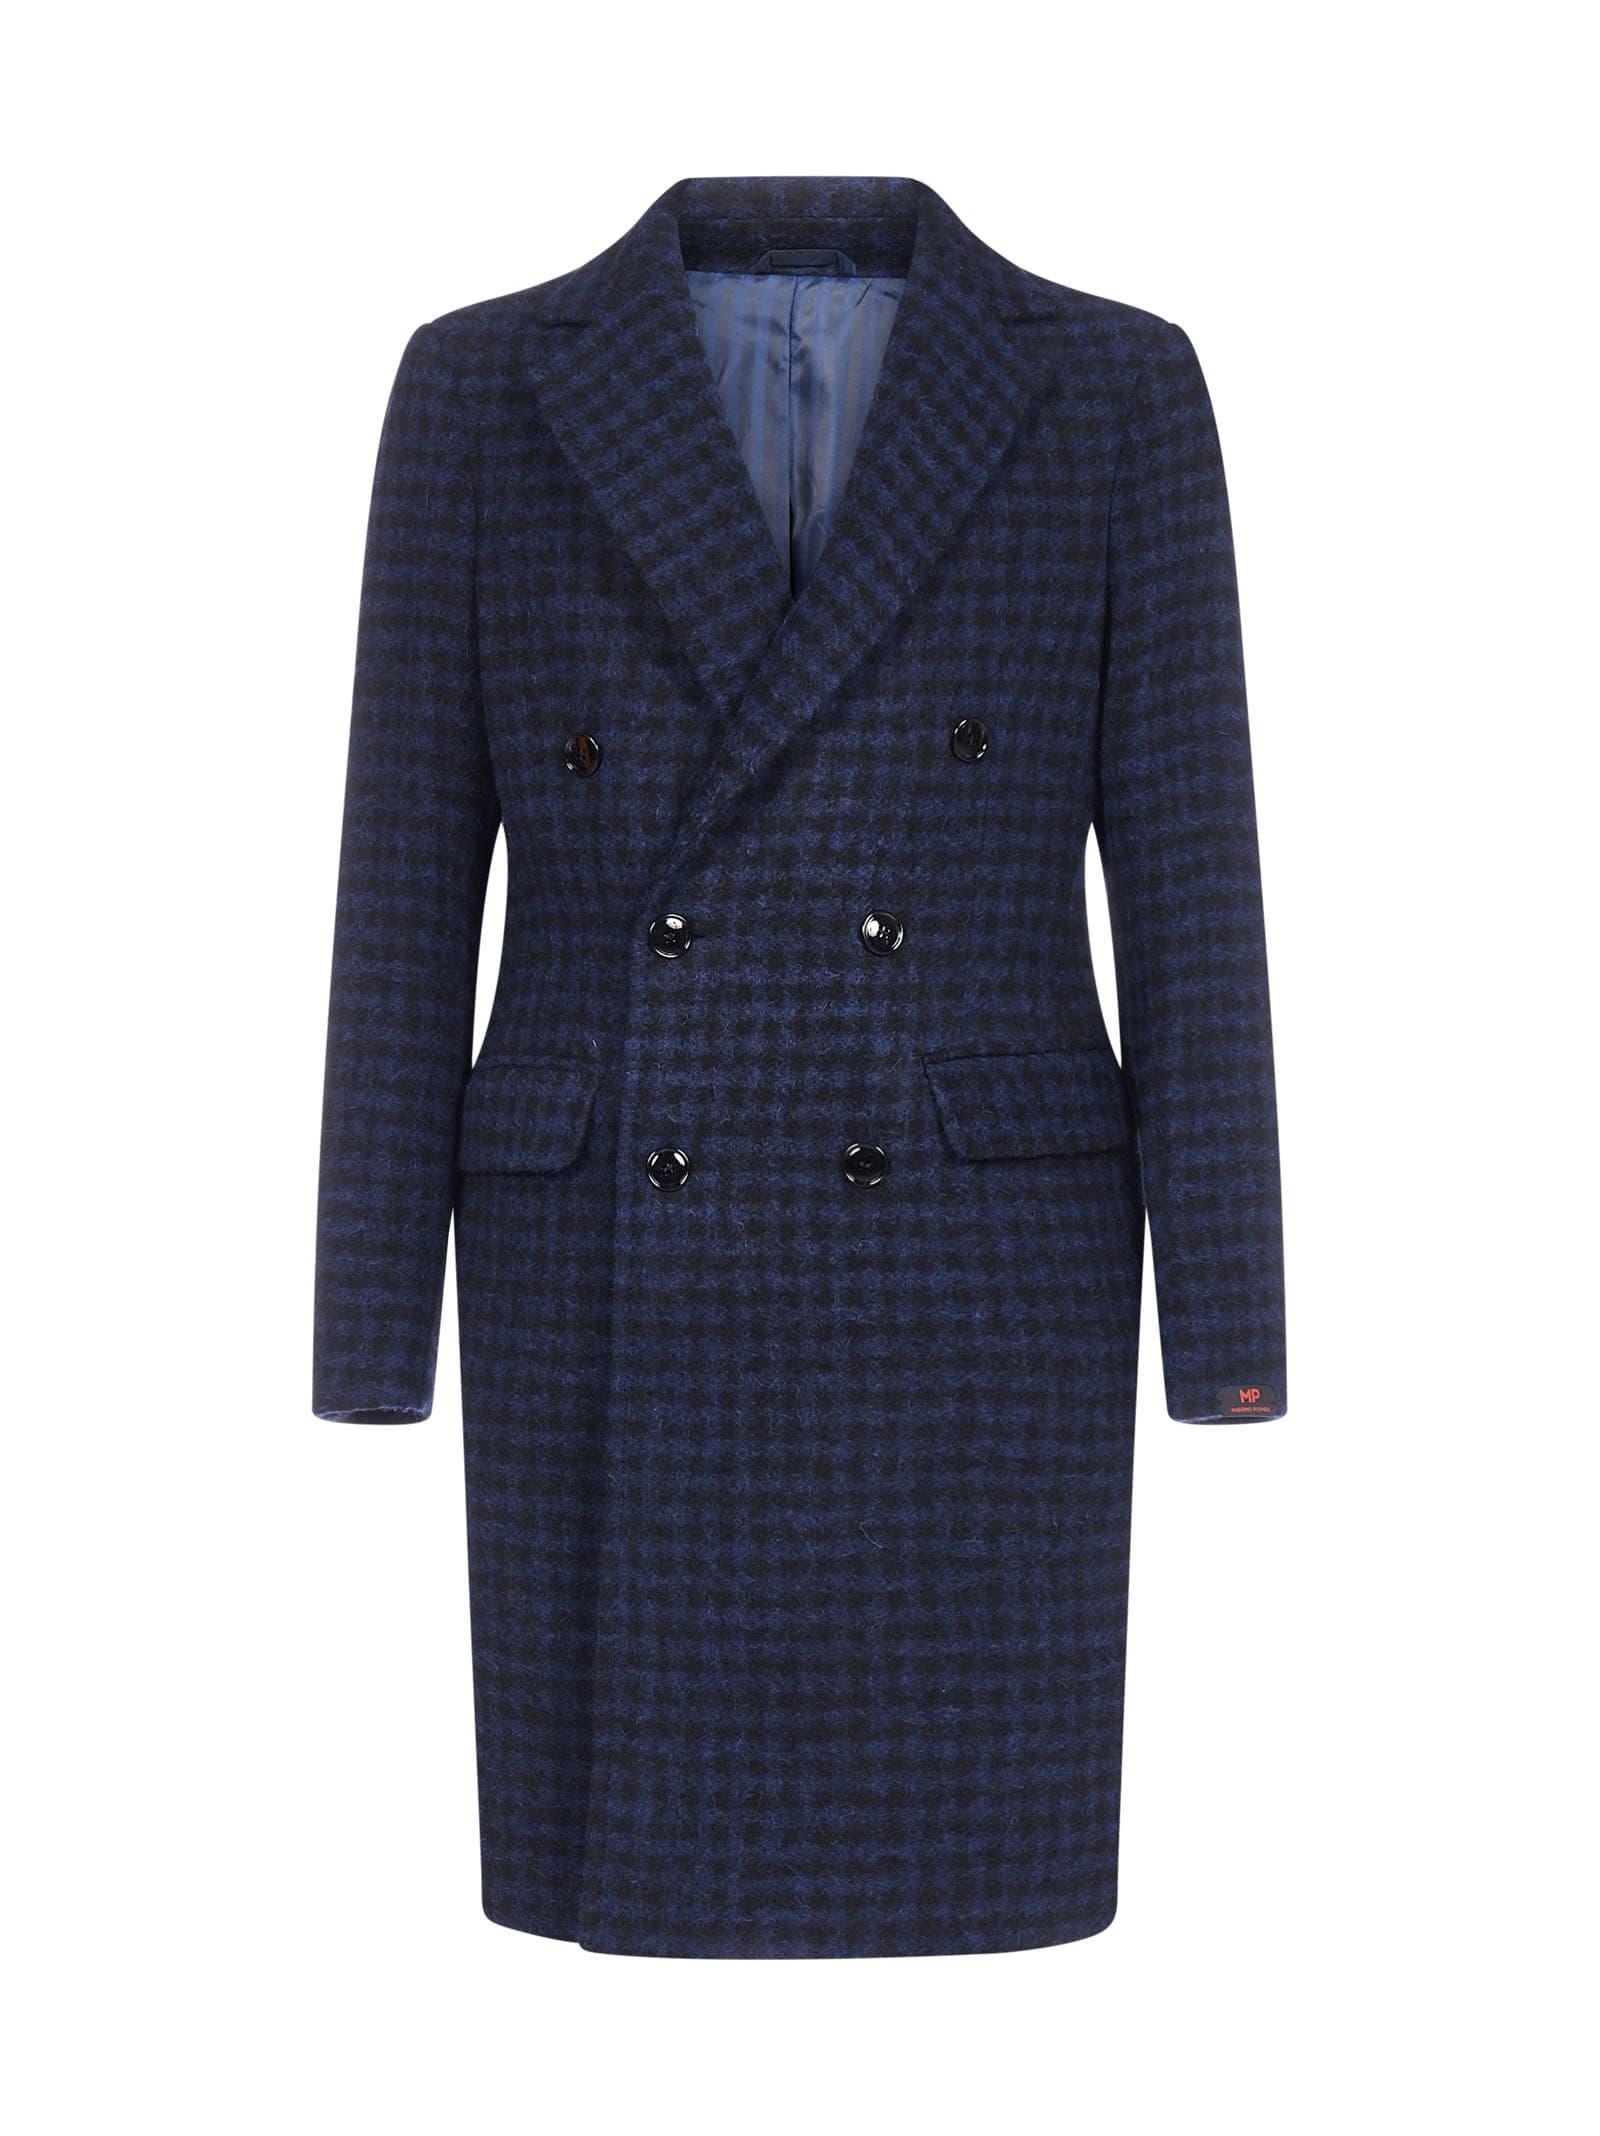 Roger Double-breasted Gingham Virgin Wool Coat